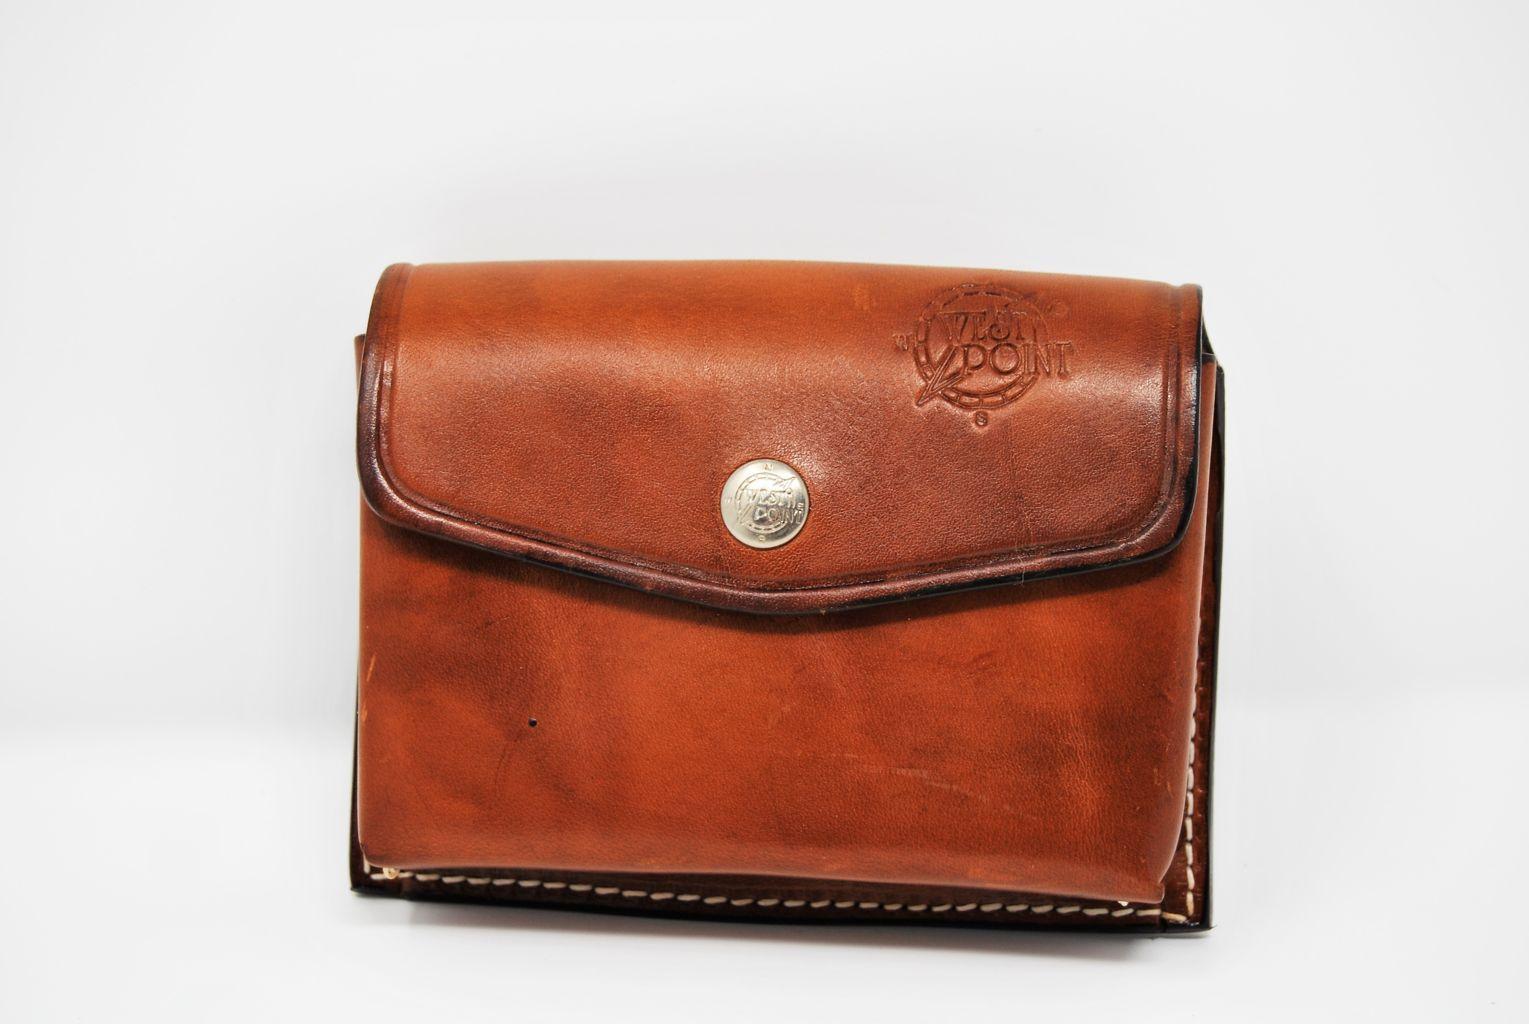 Porta oggetti / Tasca da cintura AC 24